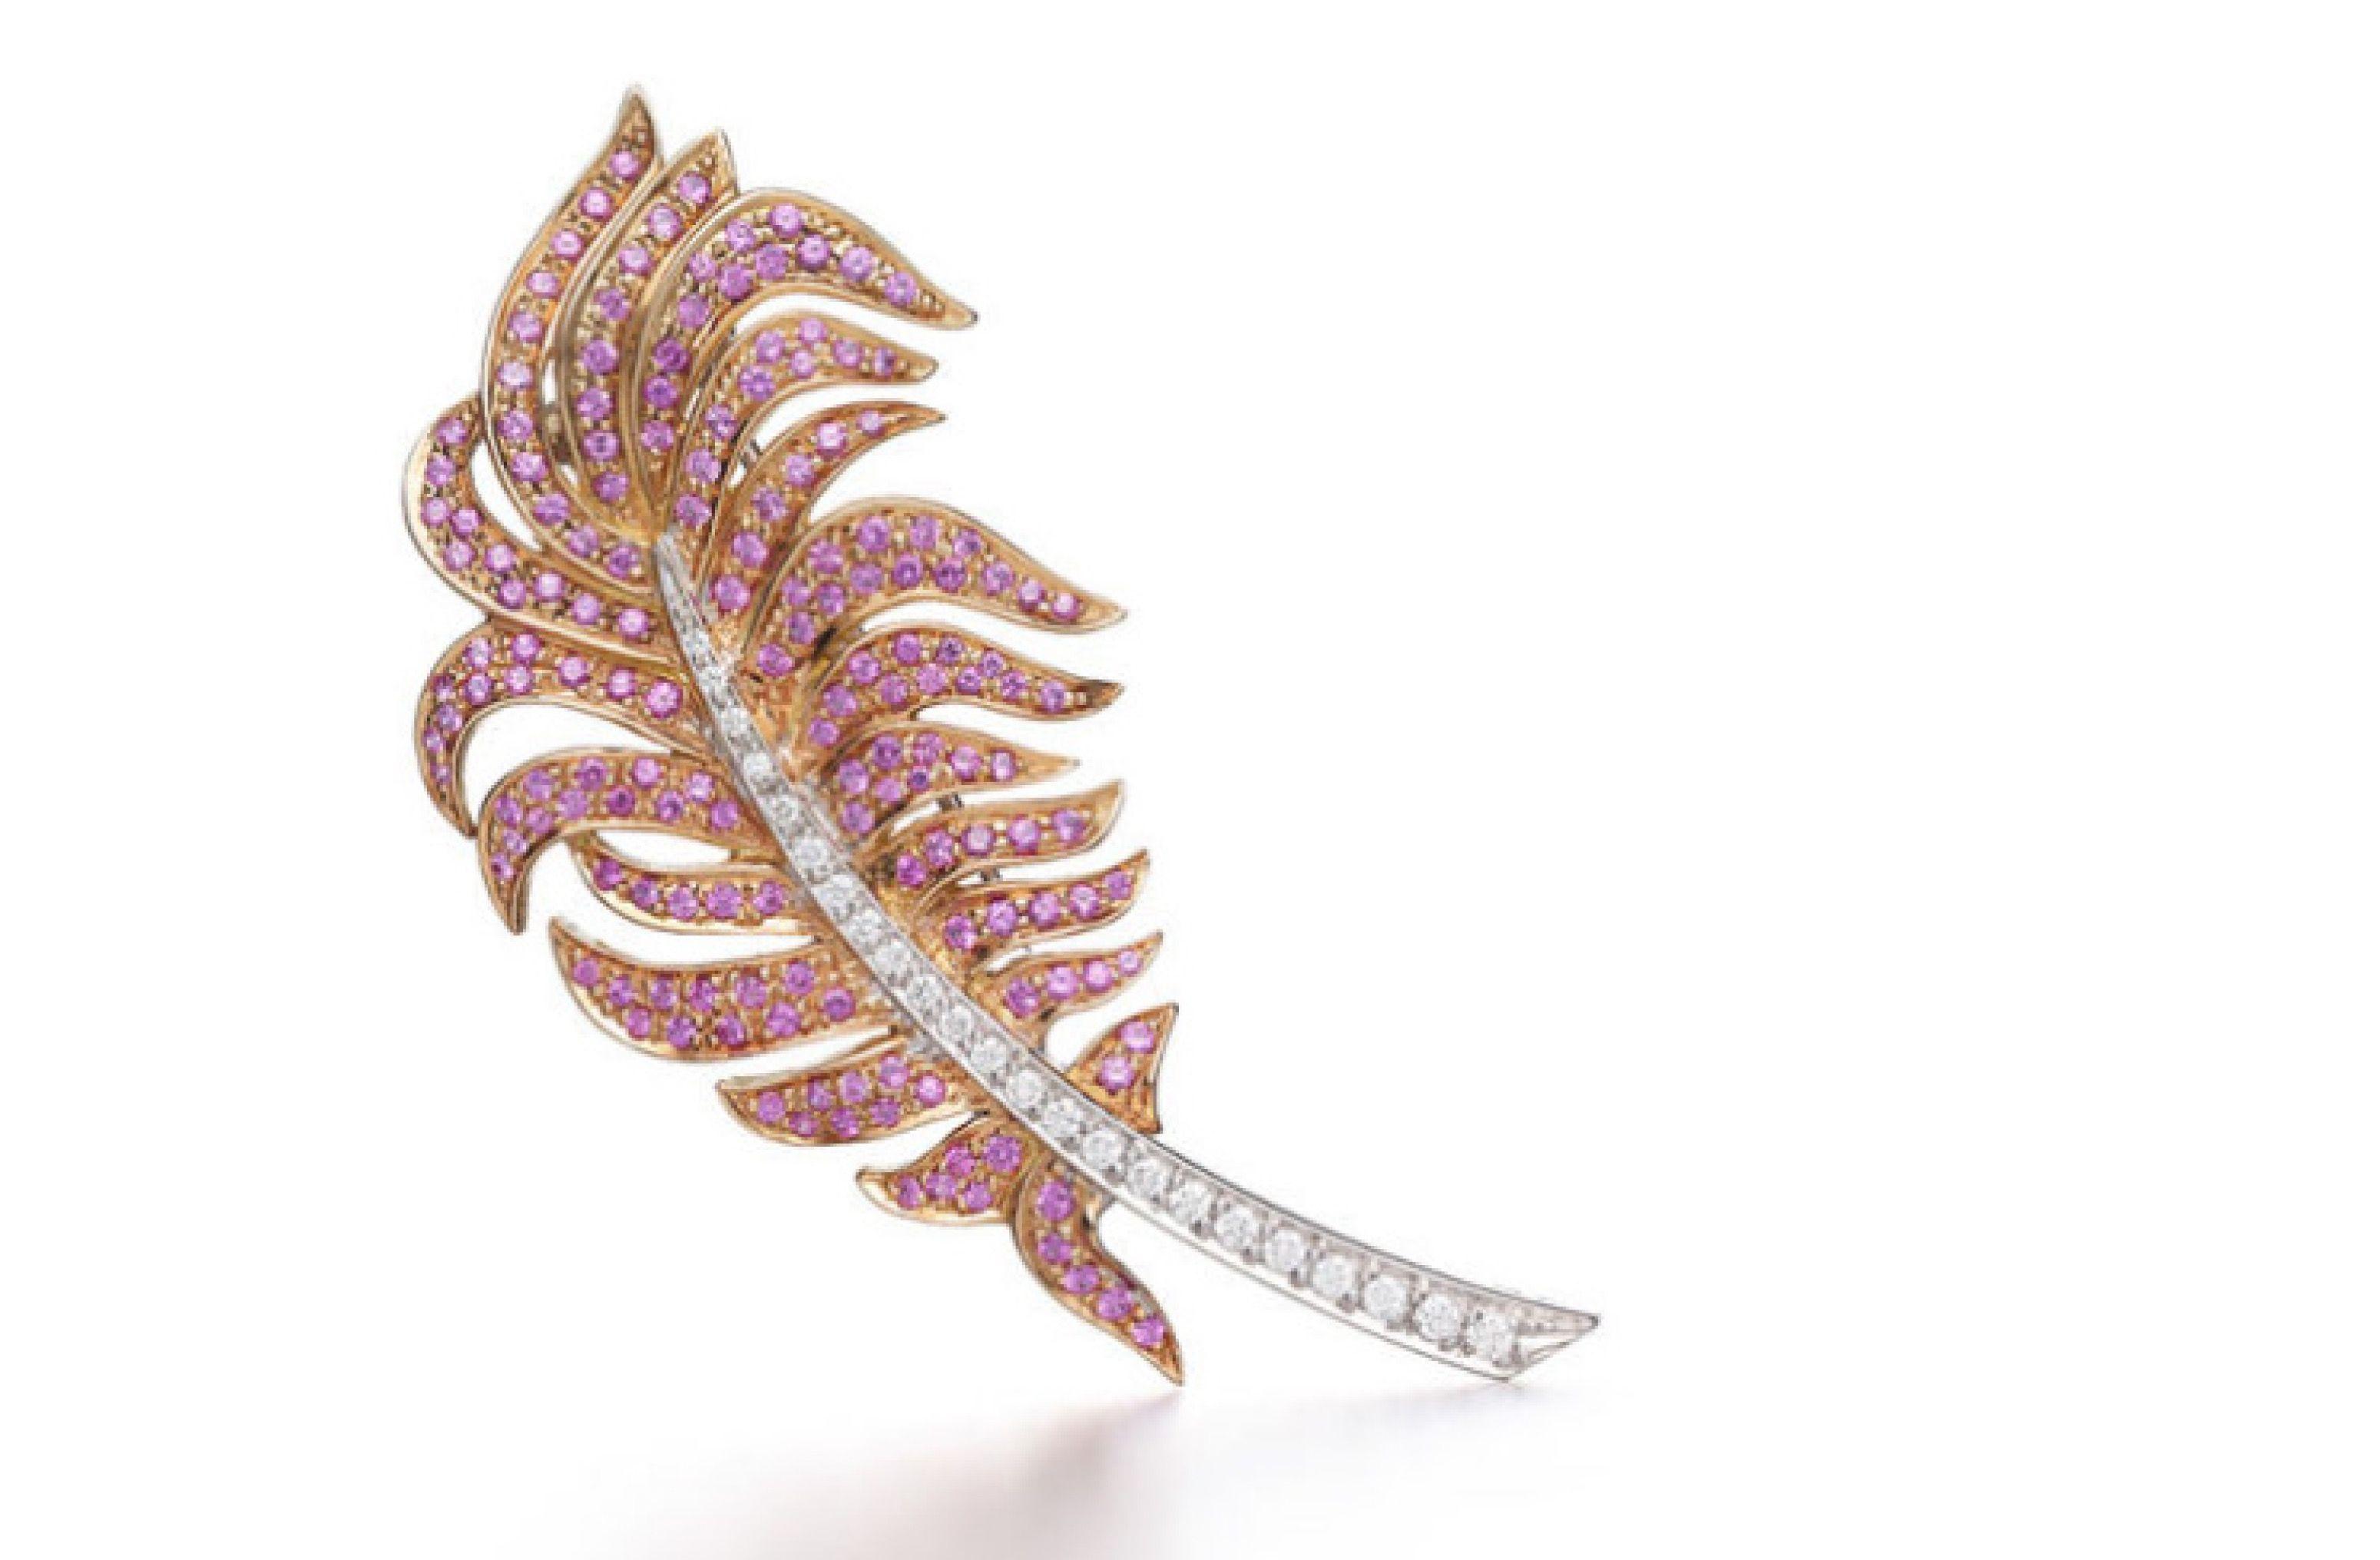 JewelryWhite_16.jpg